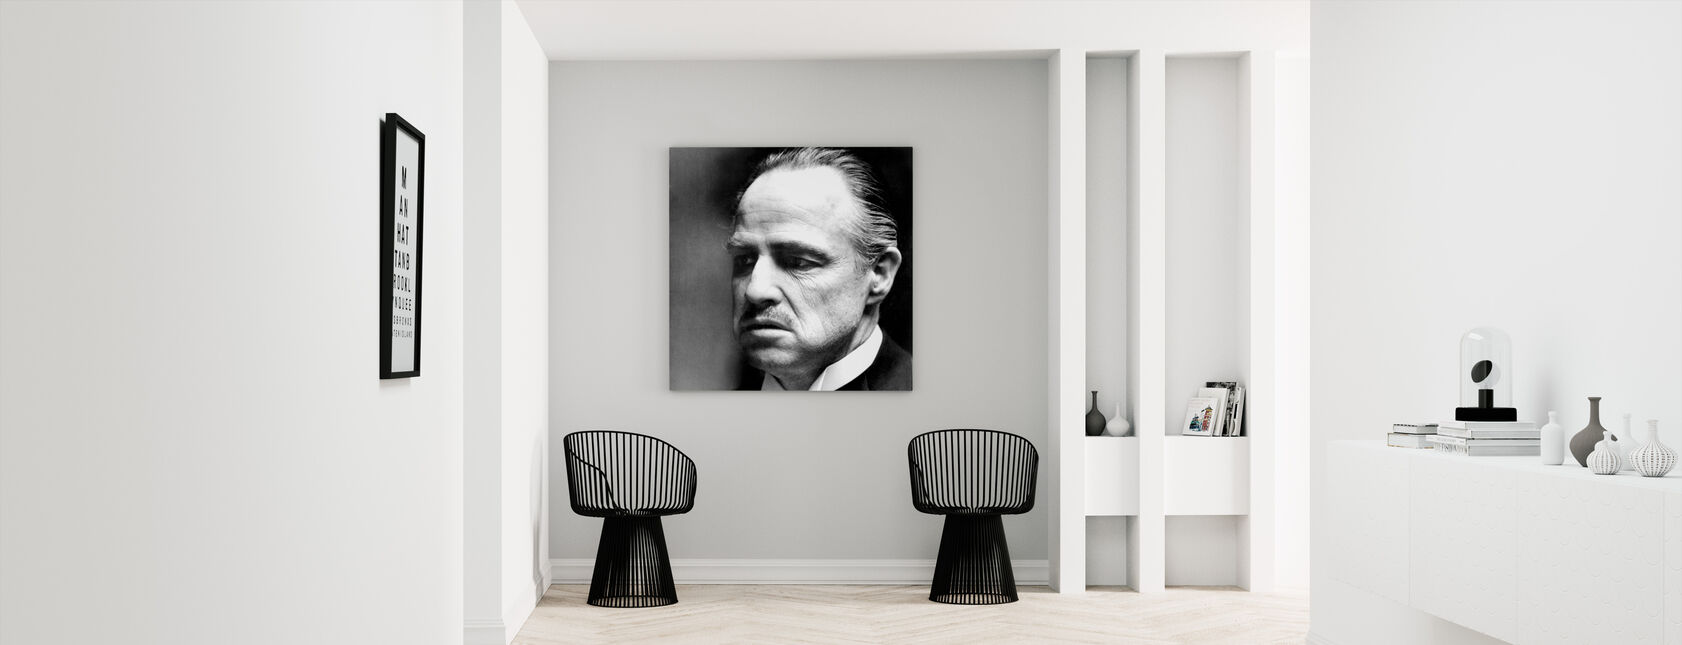 De peetvader - Don Vito Corleone - Canvas print - Gang